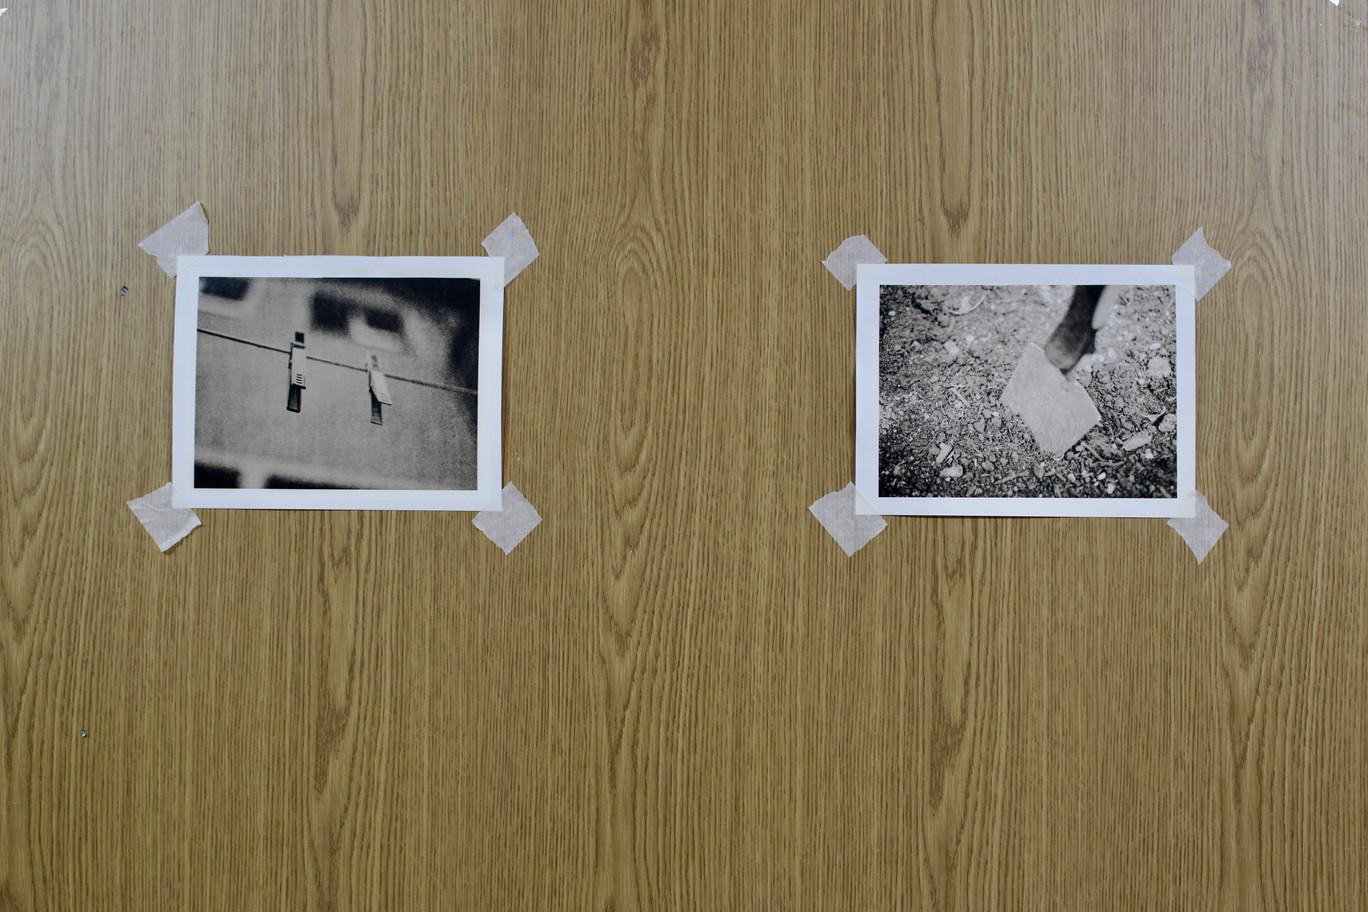 Ausstellungsansicht. No matter how much you like it, it´s work!, Michael Haupt, Foto: Bettina Siegele